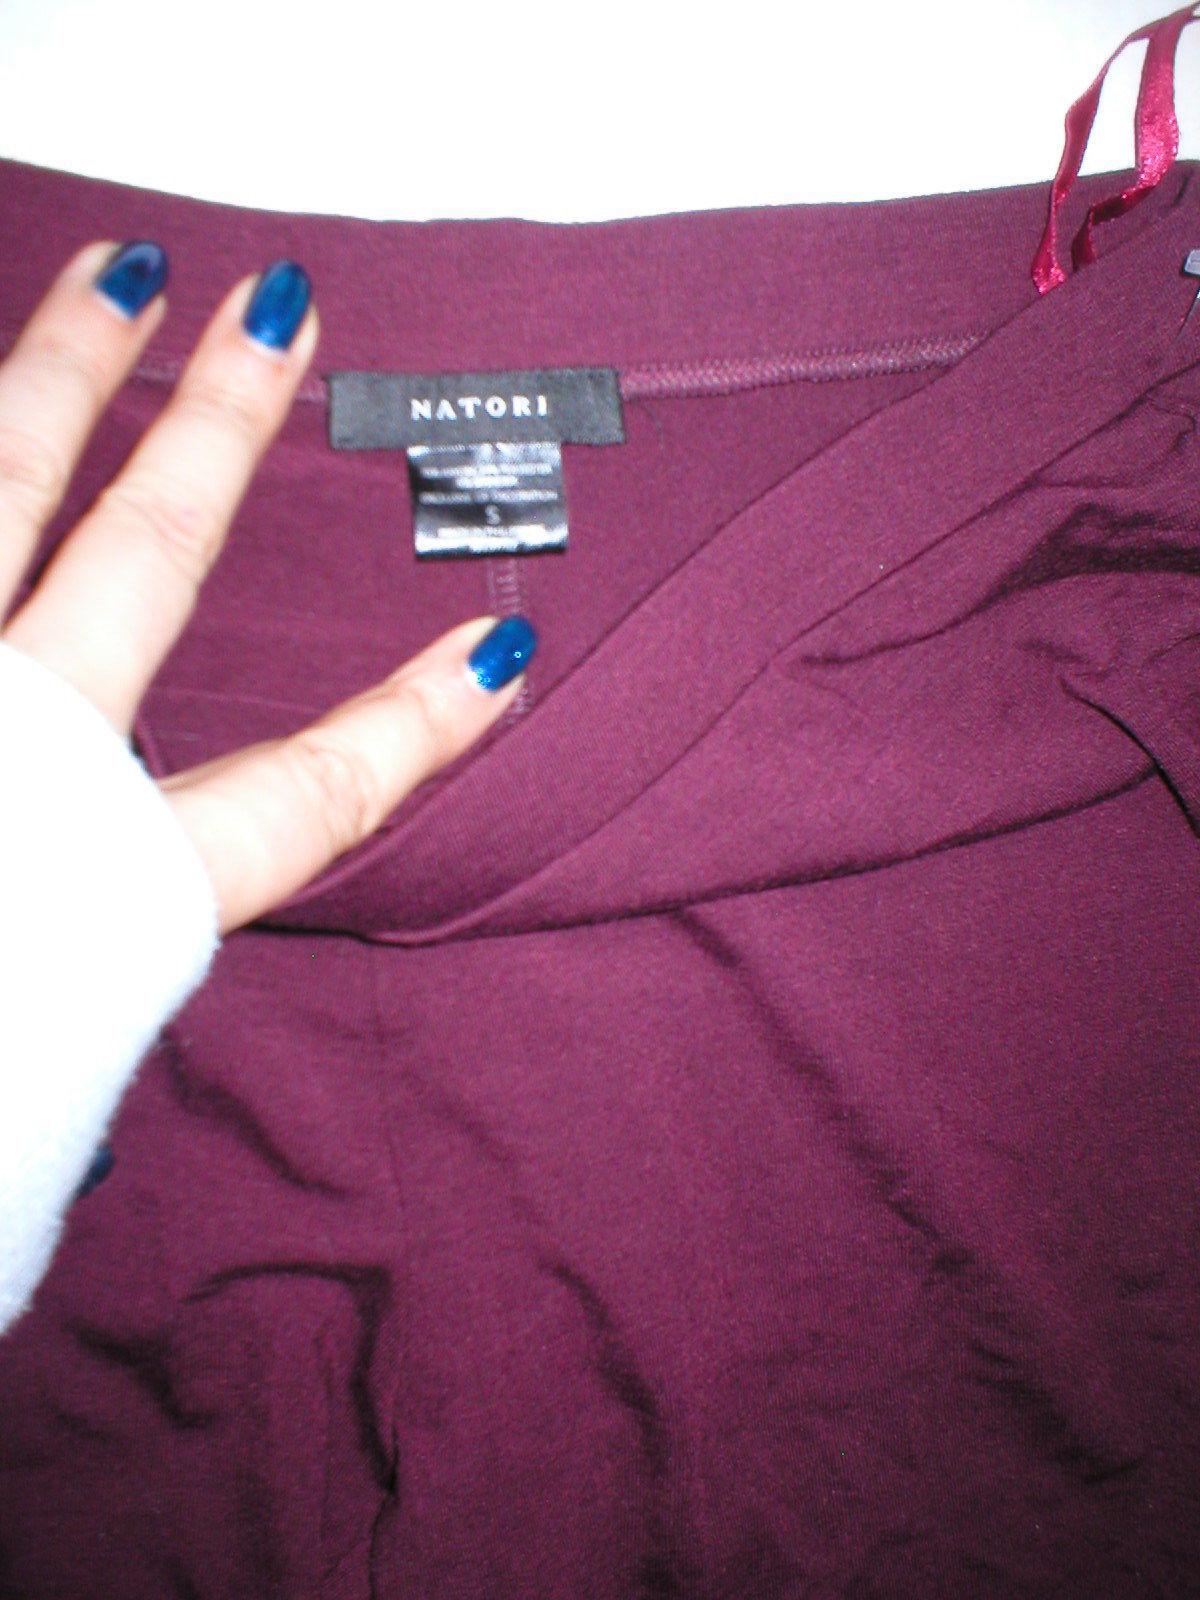 New NWT Designer Natori Dark Red Wine Pants Rayon Womens S Lounge Pajama PJ Tall